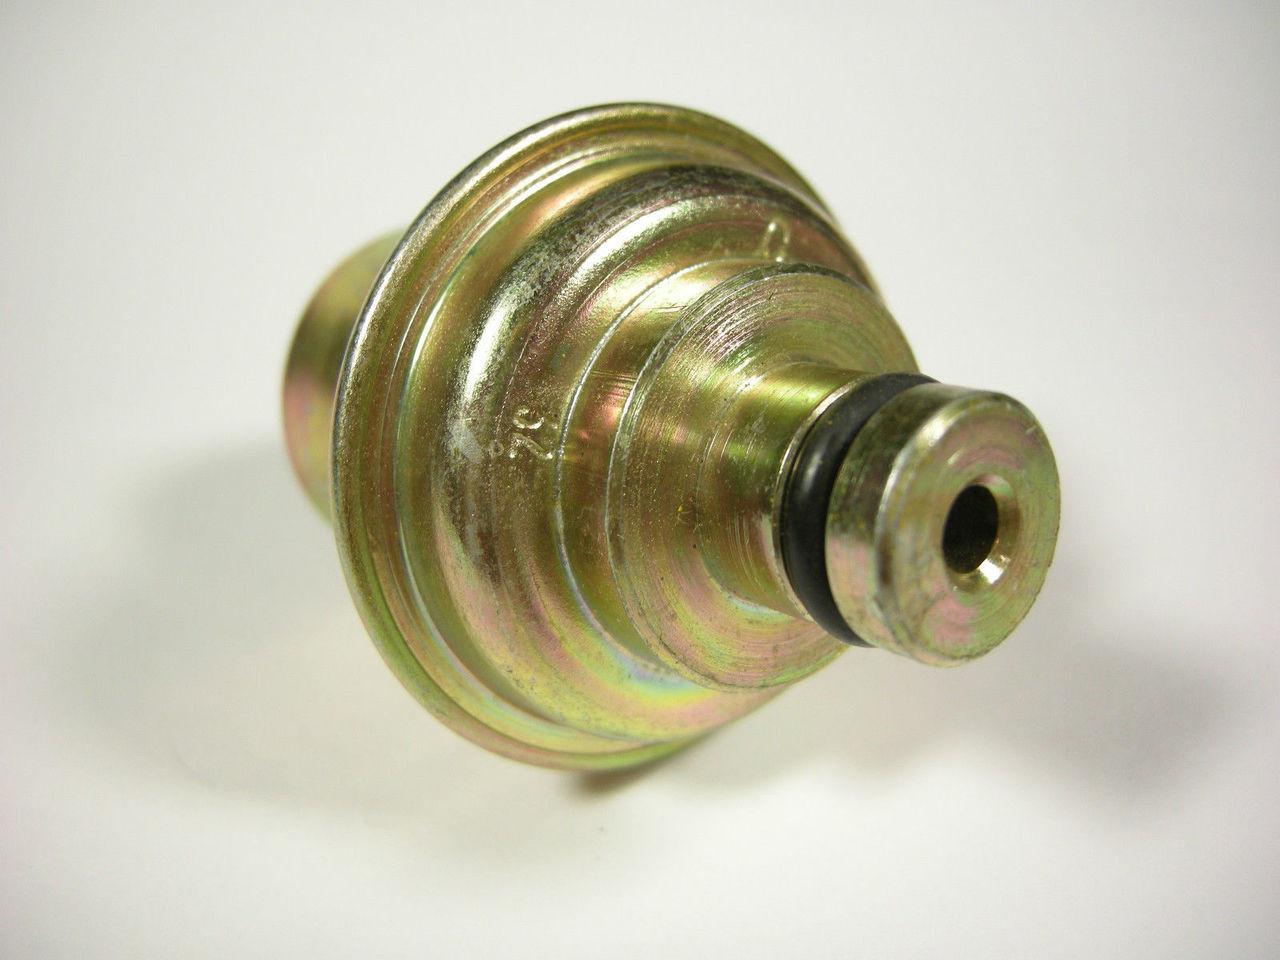 C4 TRANSMISSION VACUUM MODULATOR Push in YELLOW Stripe Adjustable